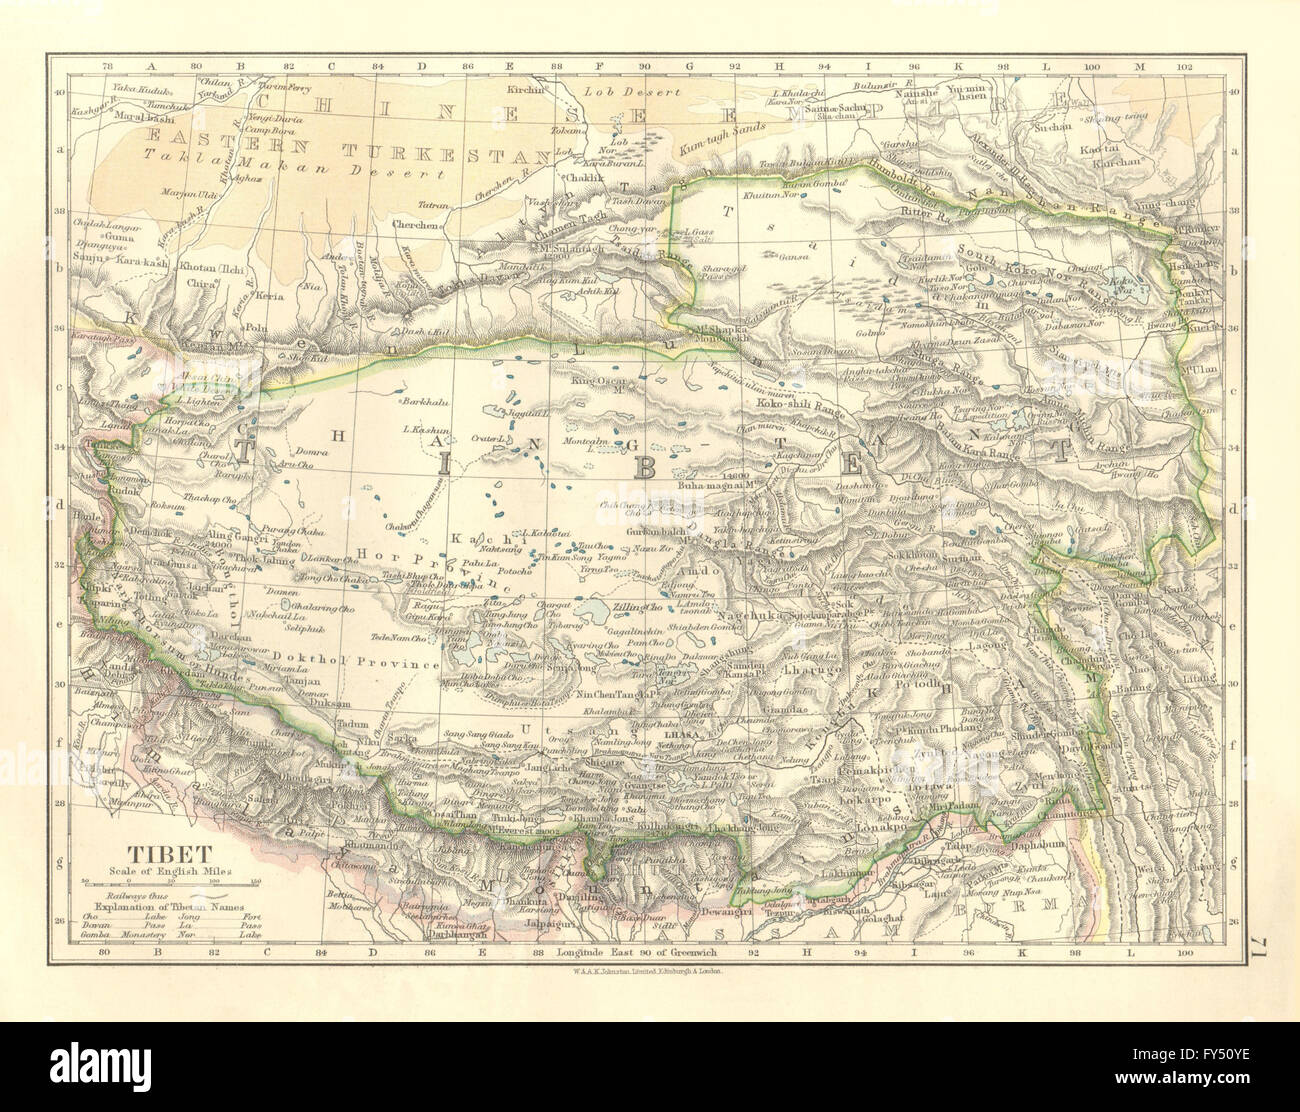 TIBET. Lhasa Chang Tang Himalayas Taklamakan desert. JOHNSTON, 1906 on